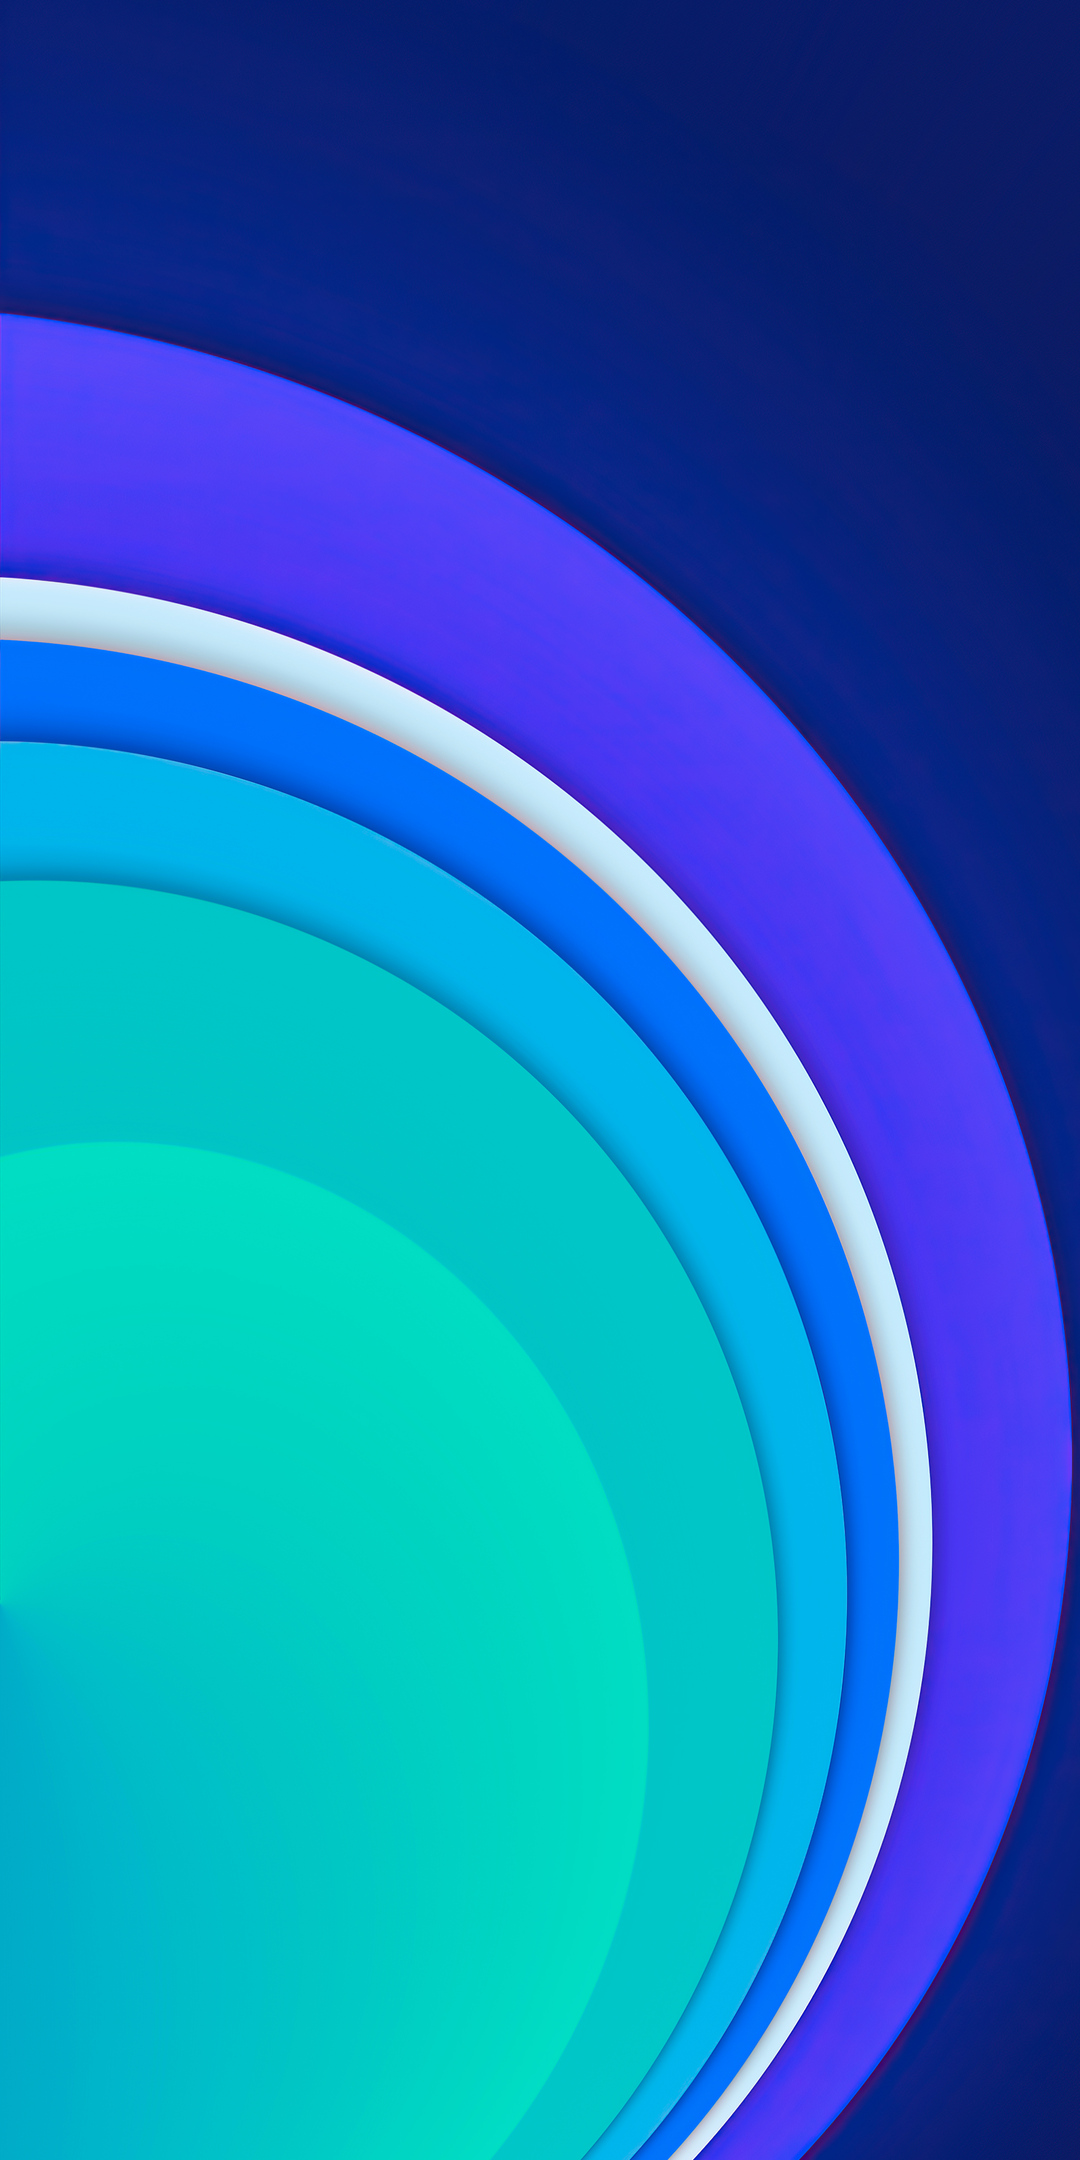 cool-circle-abstract-shape-8k-lv.jpg